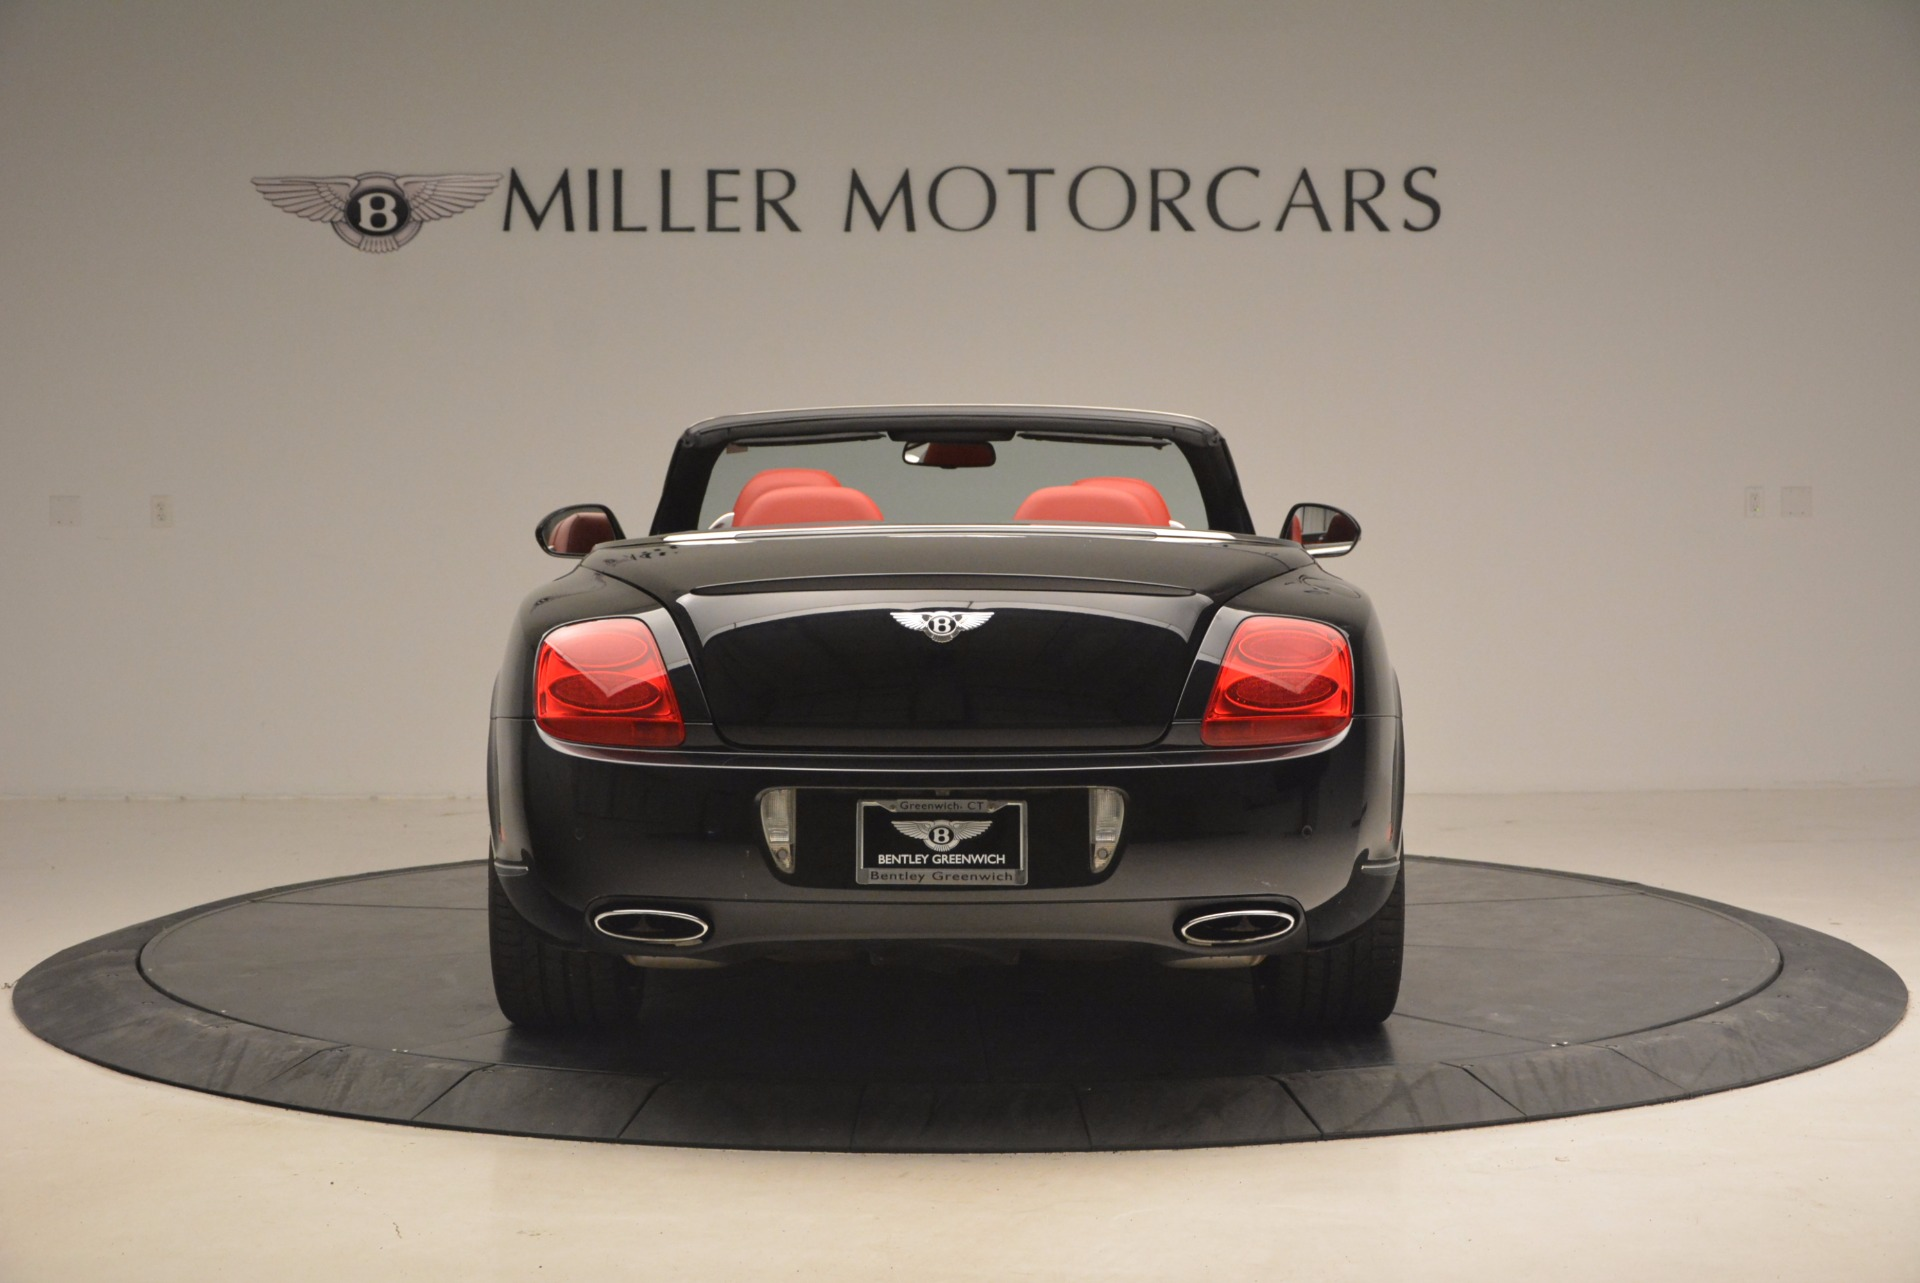 Used 2010 Bentley Continental GT Speed For Sale In Westport, CT 1298_p6